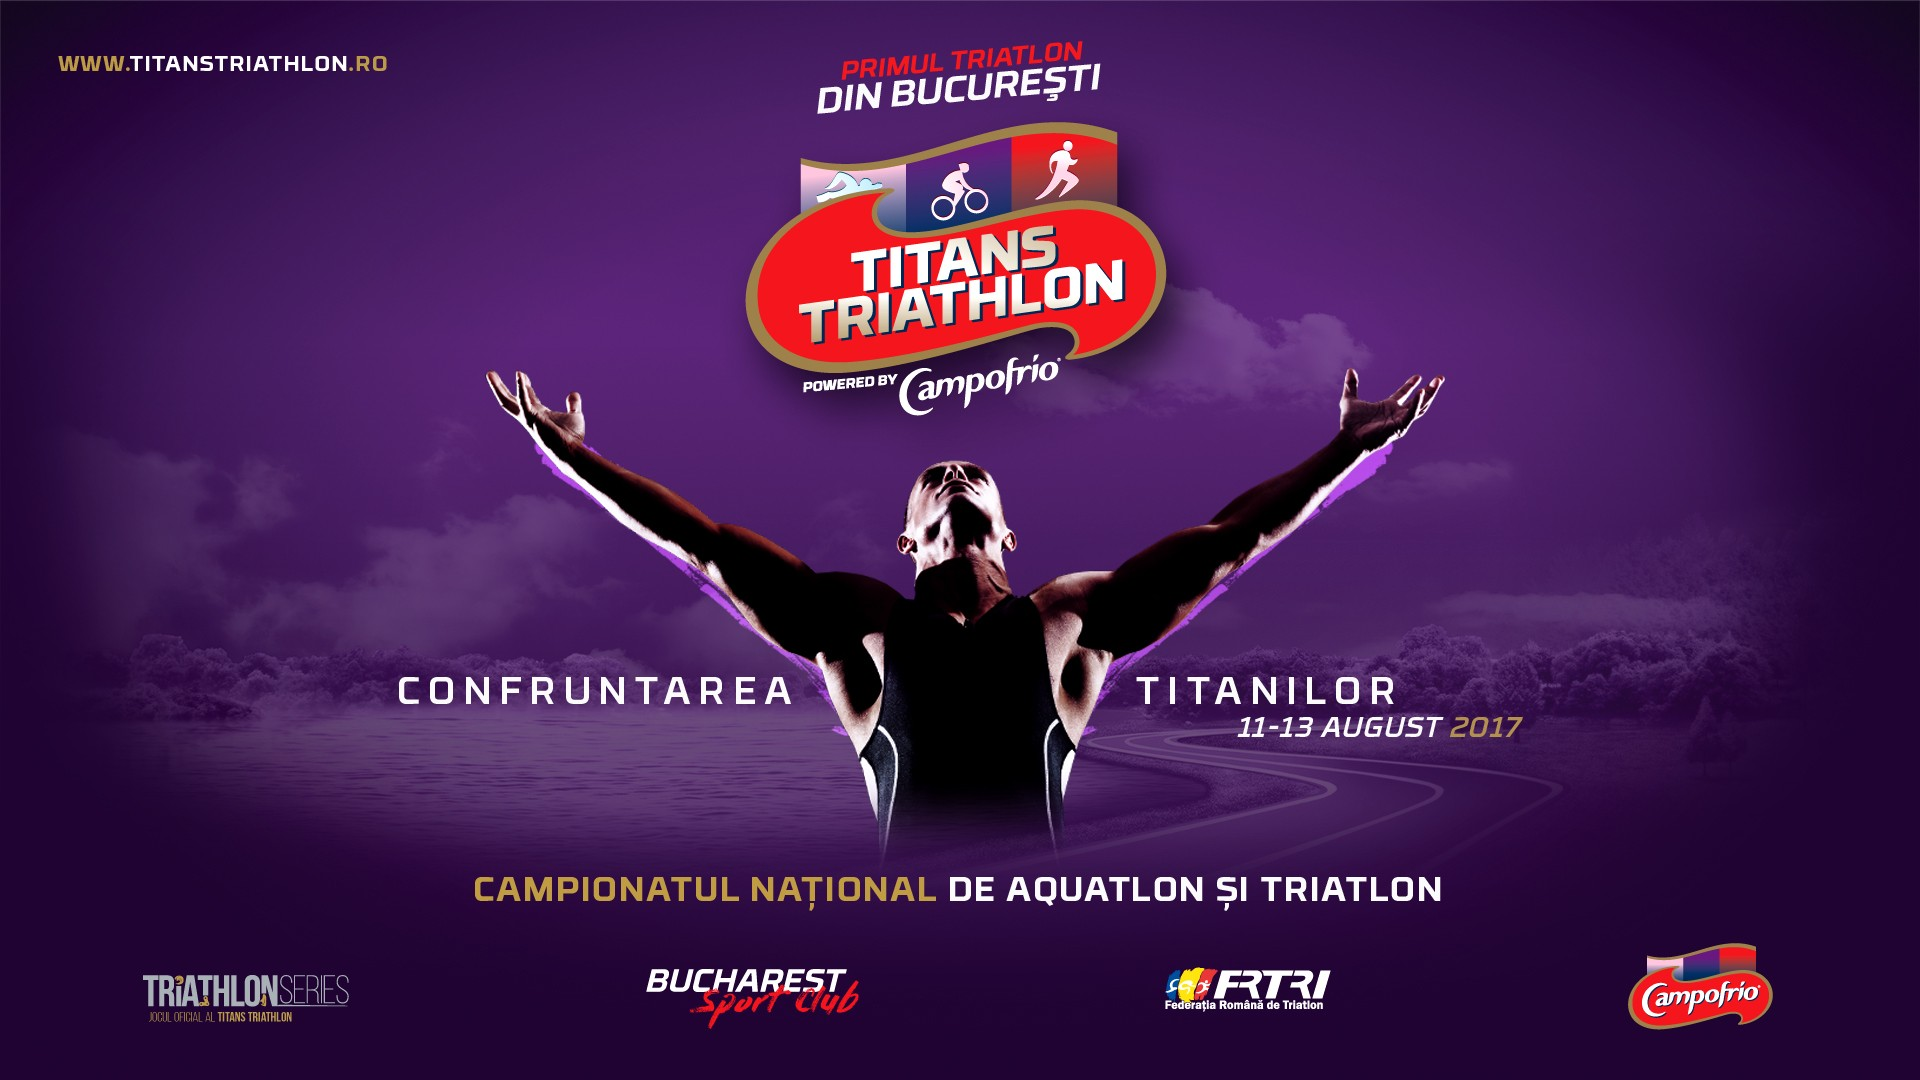 Titans triatlon